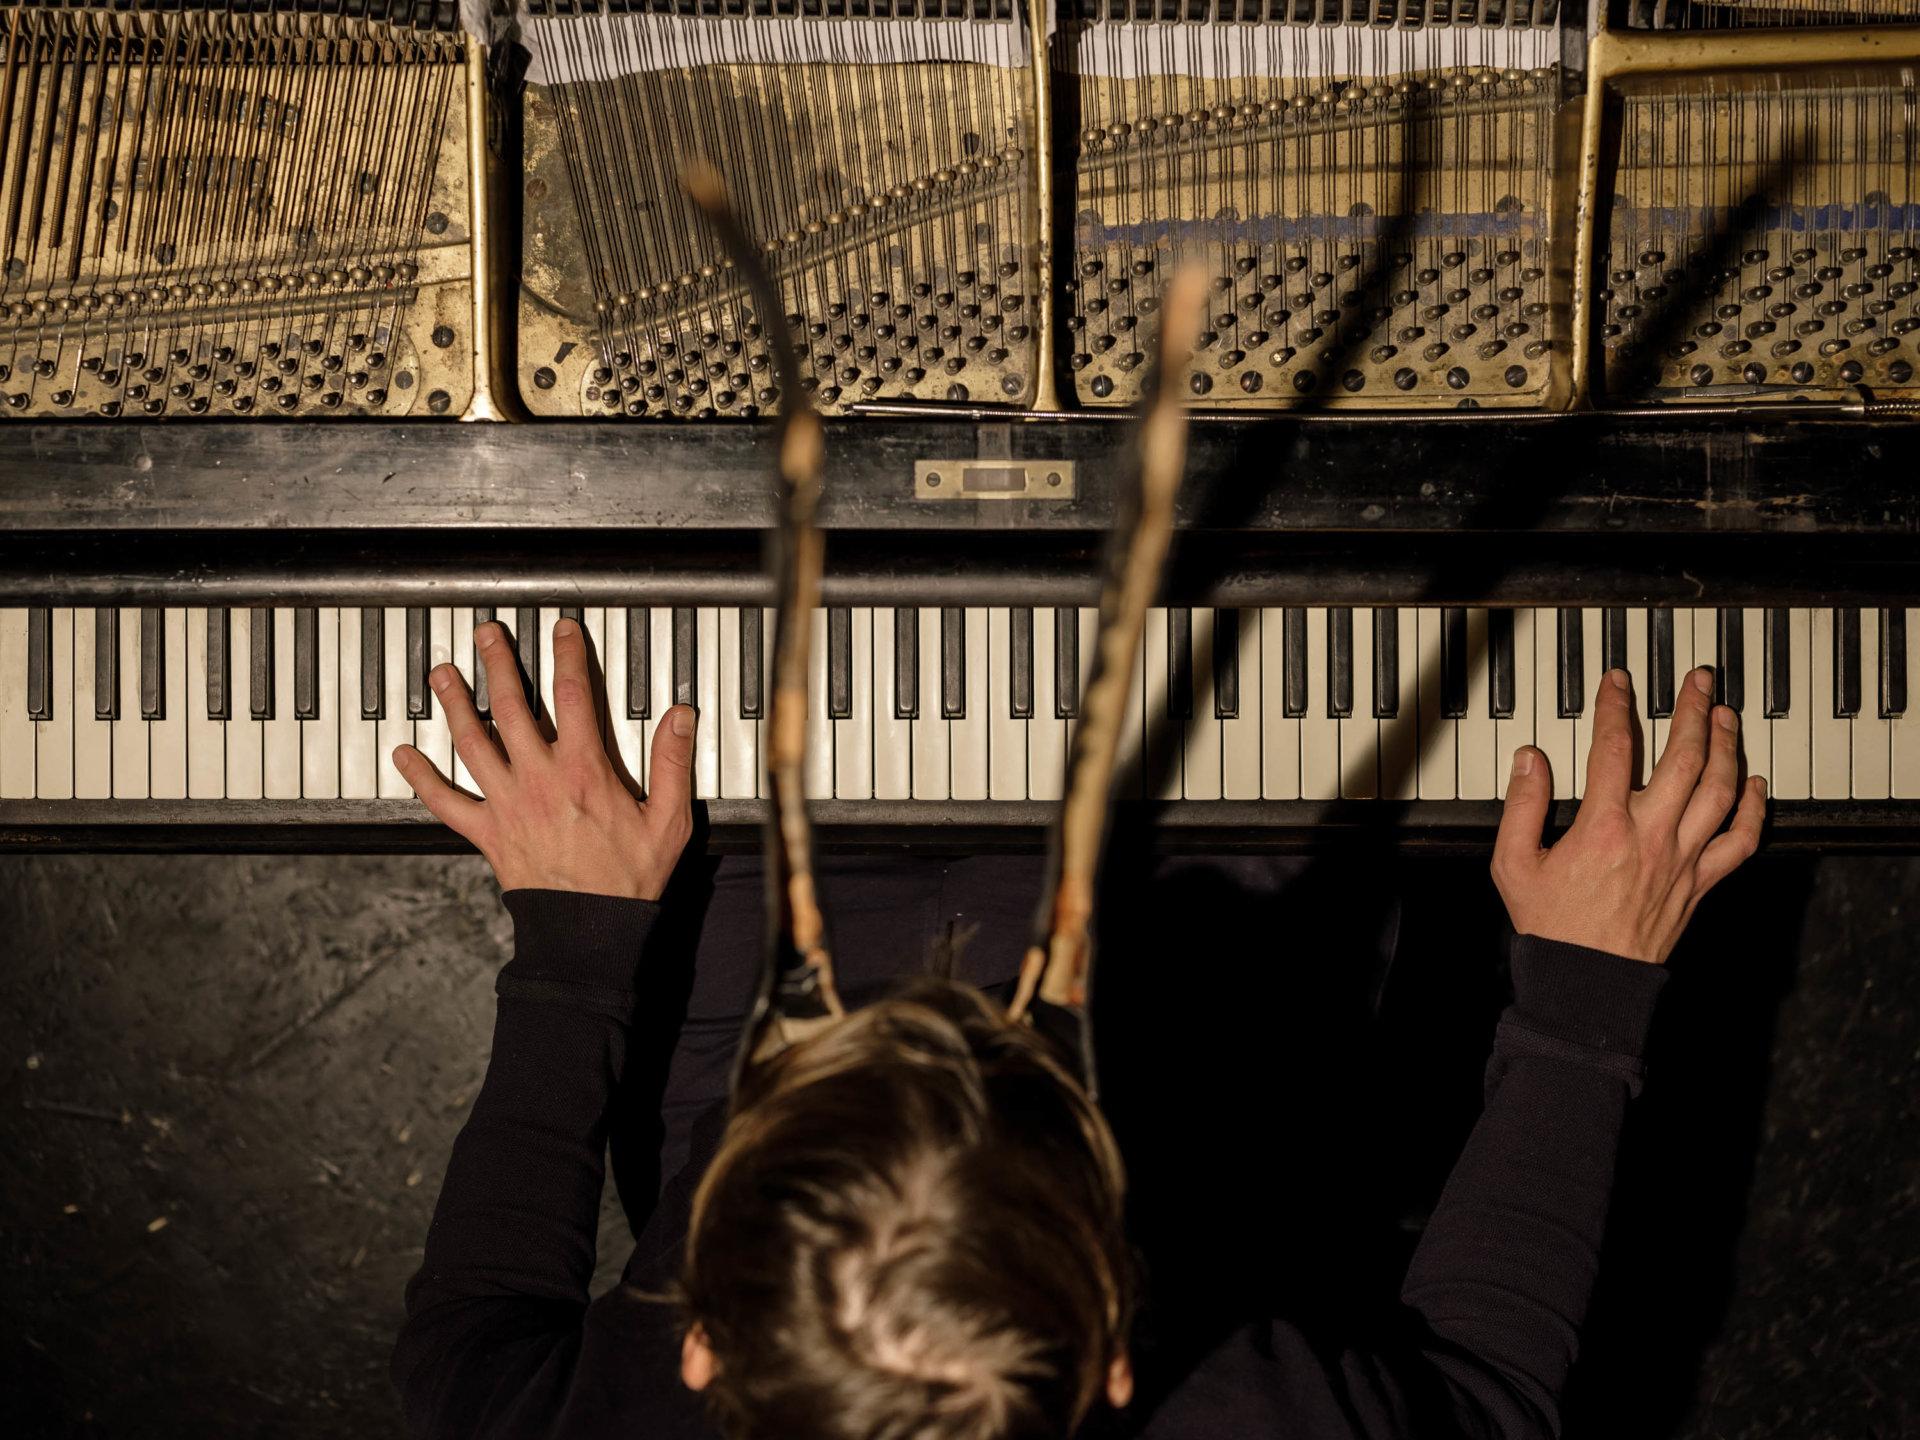 DRUCKEN!, Kultur, MASTERBILD, Pianist, Projekt, Serie, klavier, konzert, meisterfinger, musiker, piano